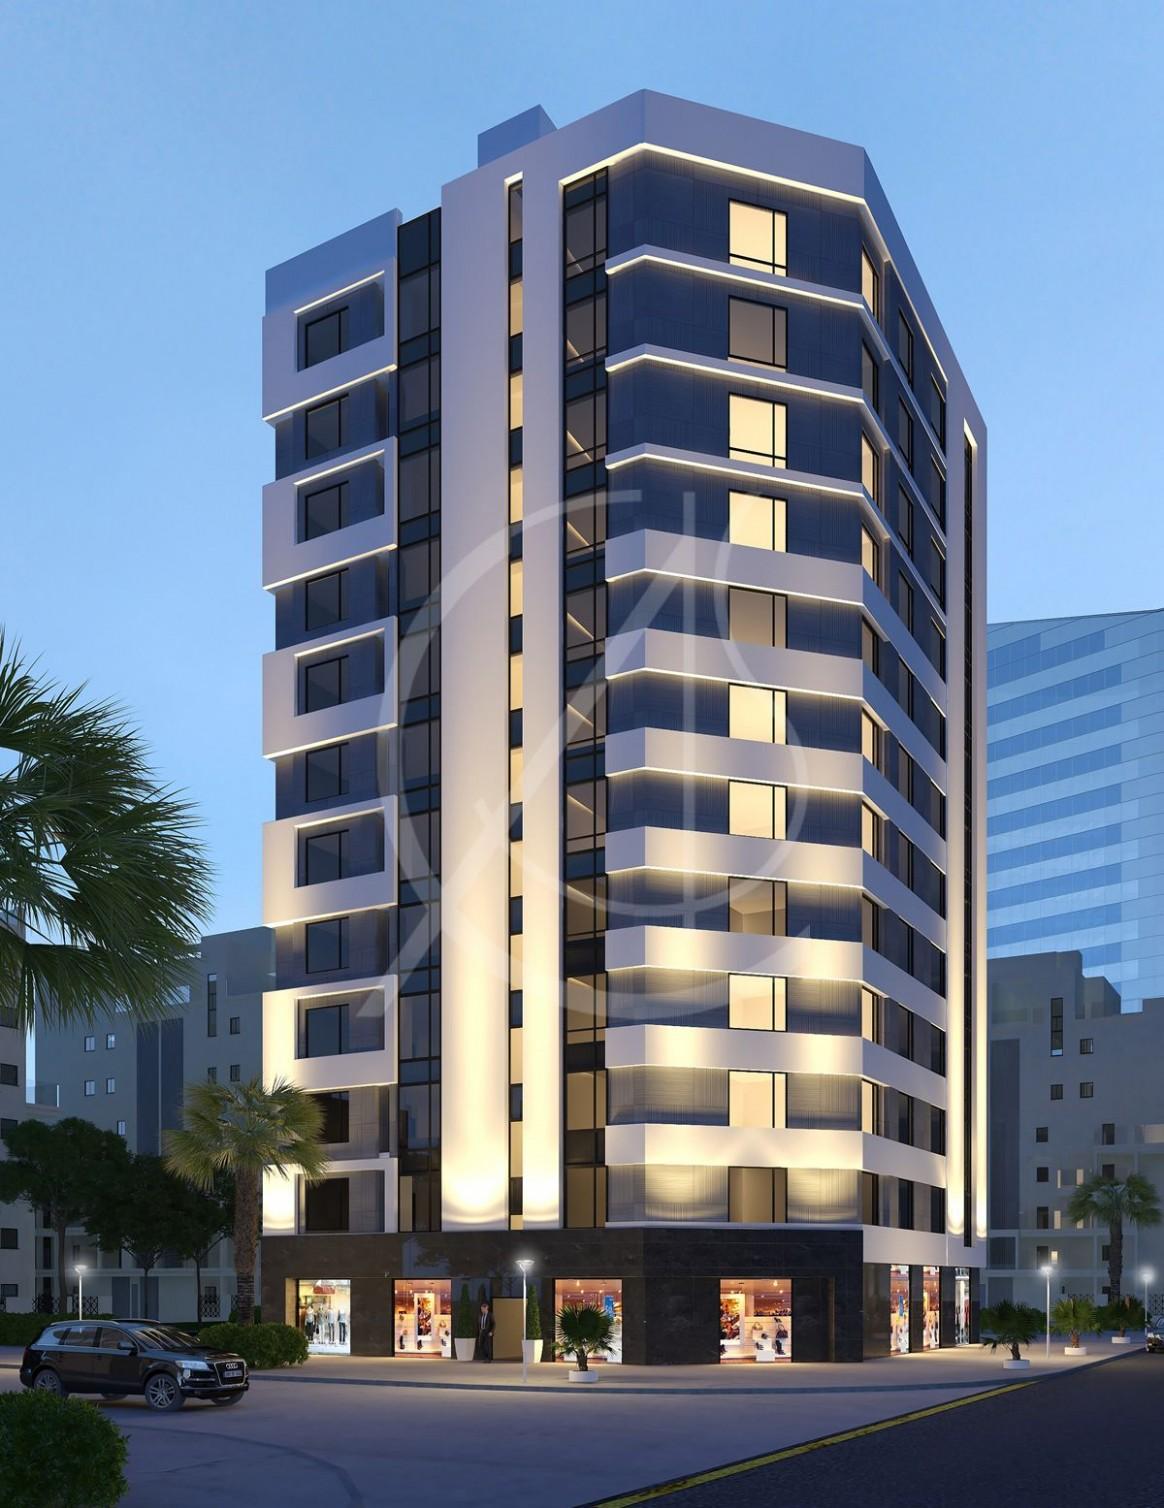 12 Story Modern Apartment Exterior Design - CAS  Apartments  - Apartment Design Building